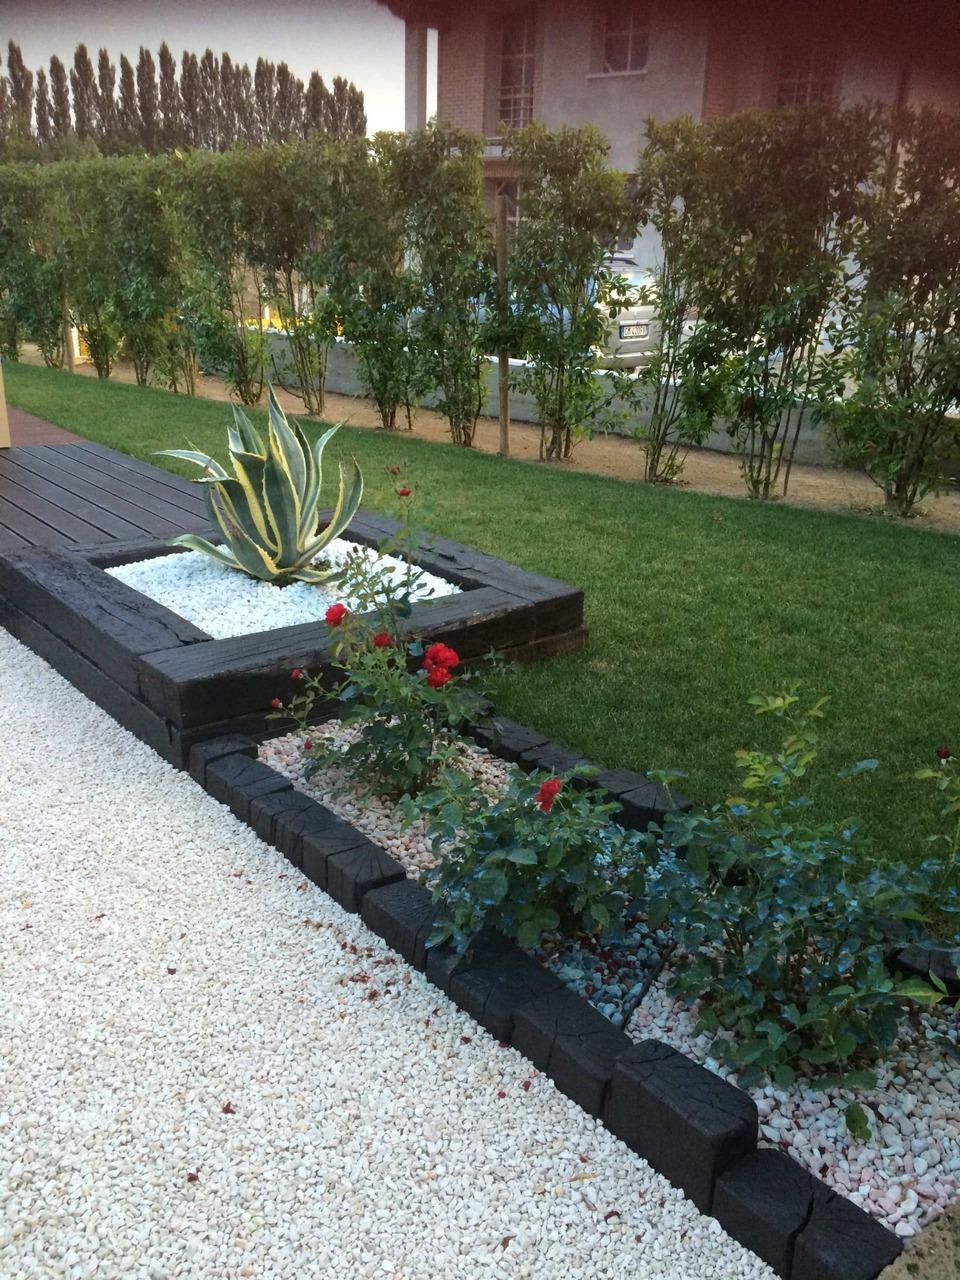 Bordura di giardino privato dese legnami for Bordura giardino prezzo